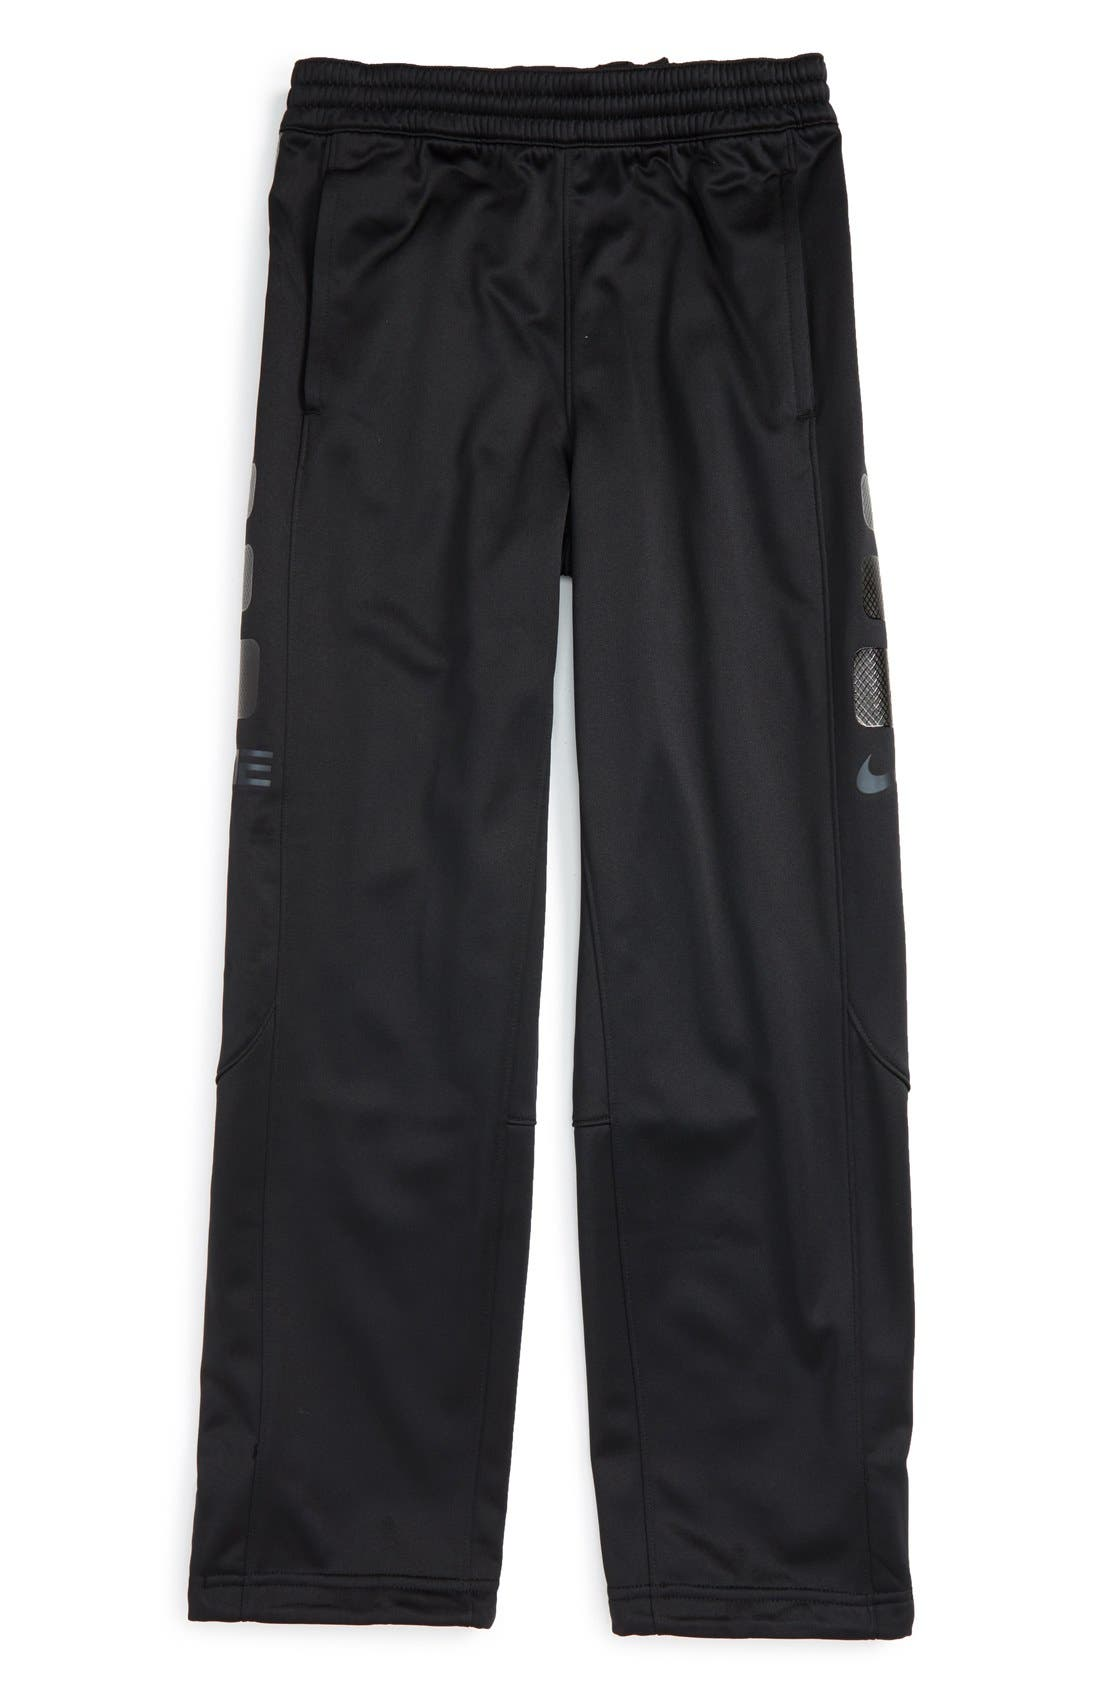 Main Image - Nike 'Elite' Therma-FIT Pants (Little Boys & Big Boys)